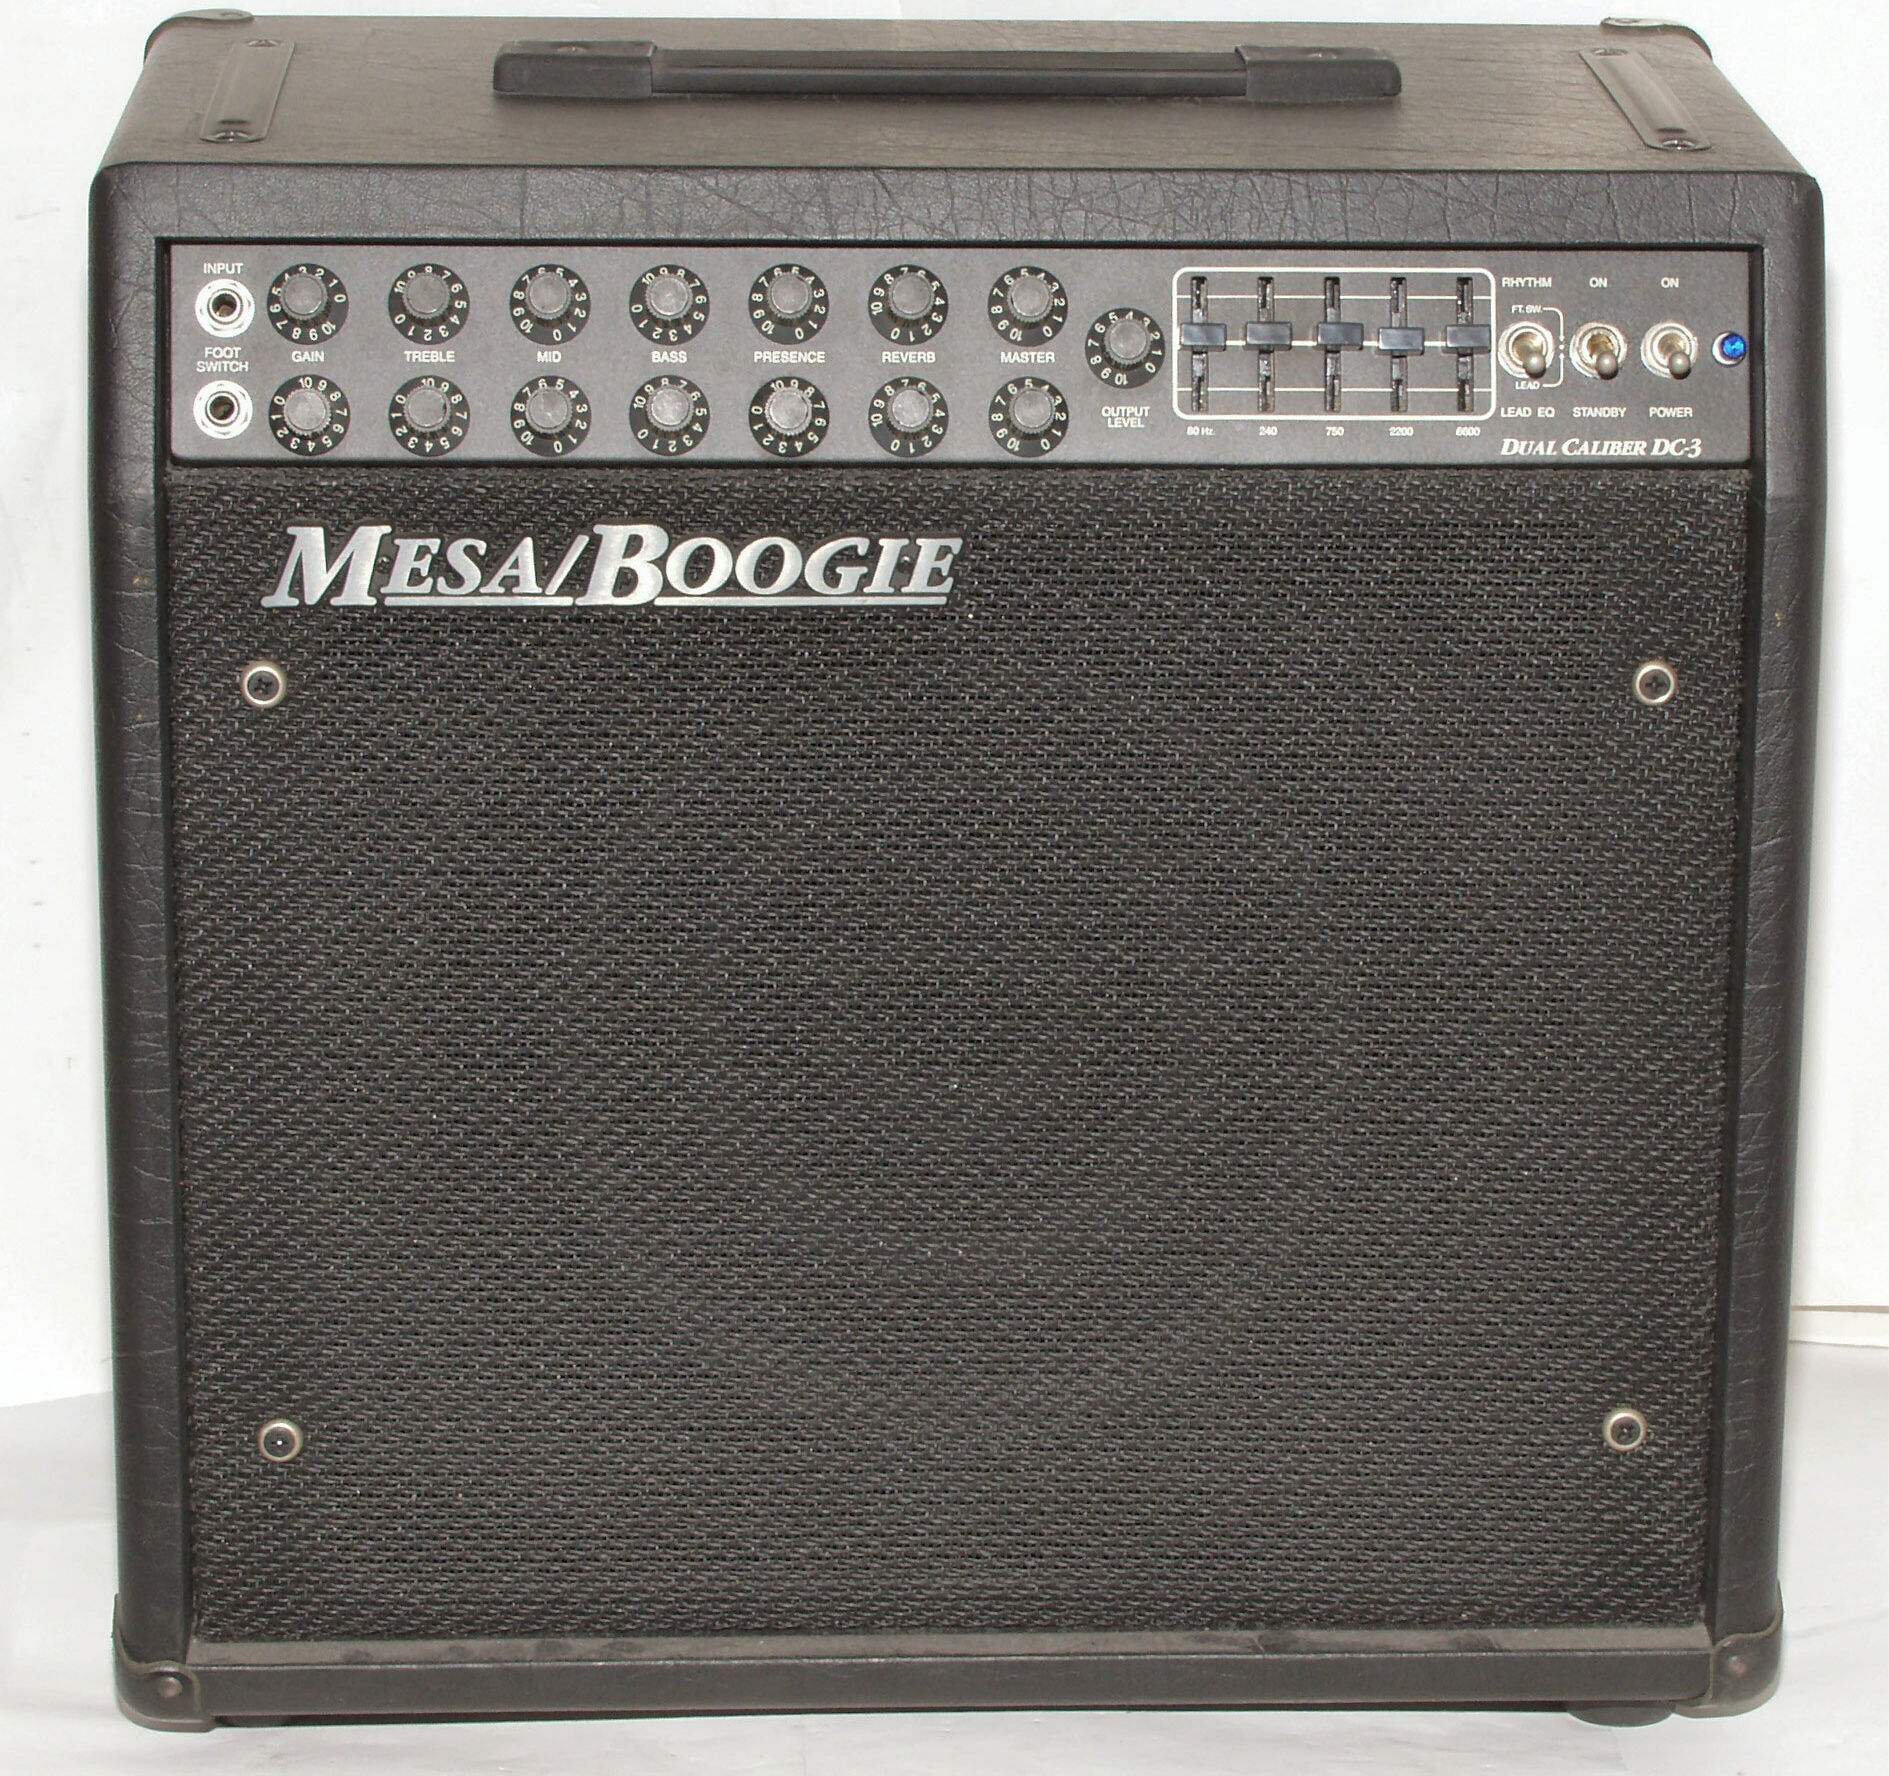 mesa boogie dual caliber dc 3 1x12 combo amp vinyl amplifier cover ebay. Black Bedroom Furniture Sets. Home Design Ideas